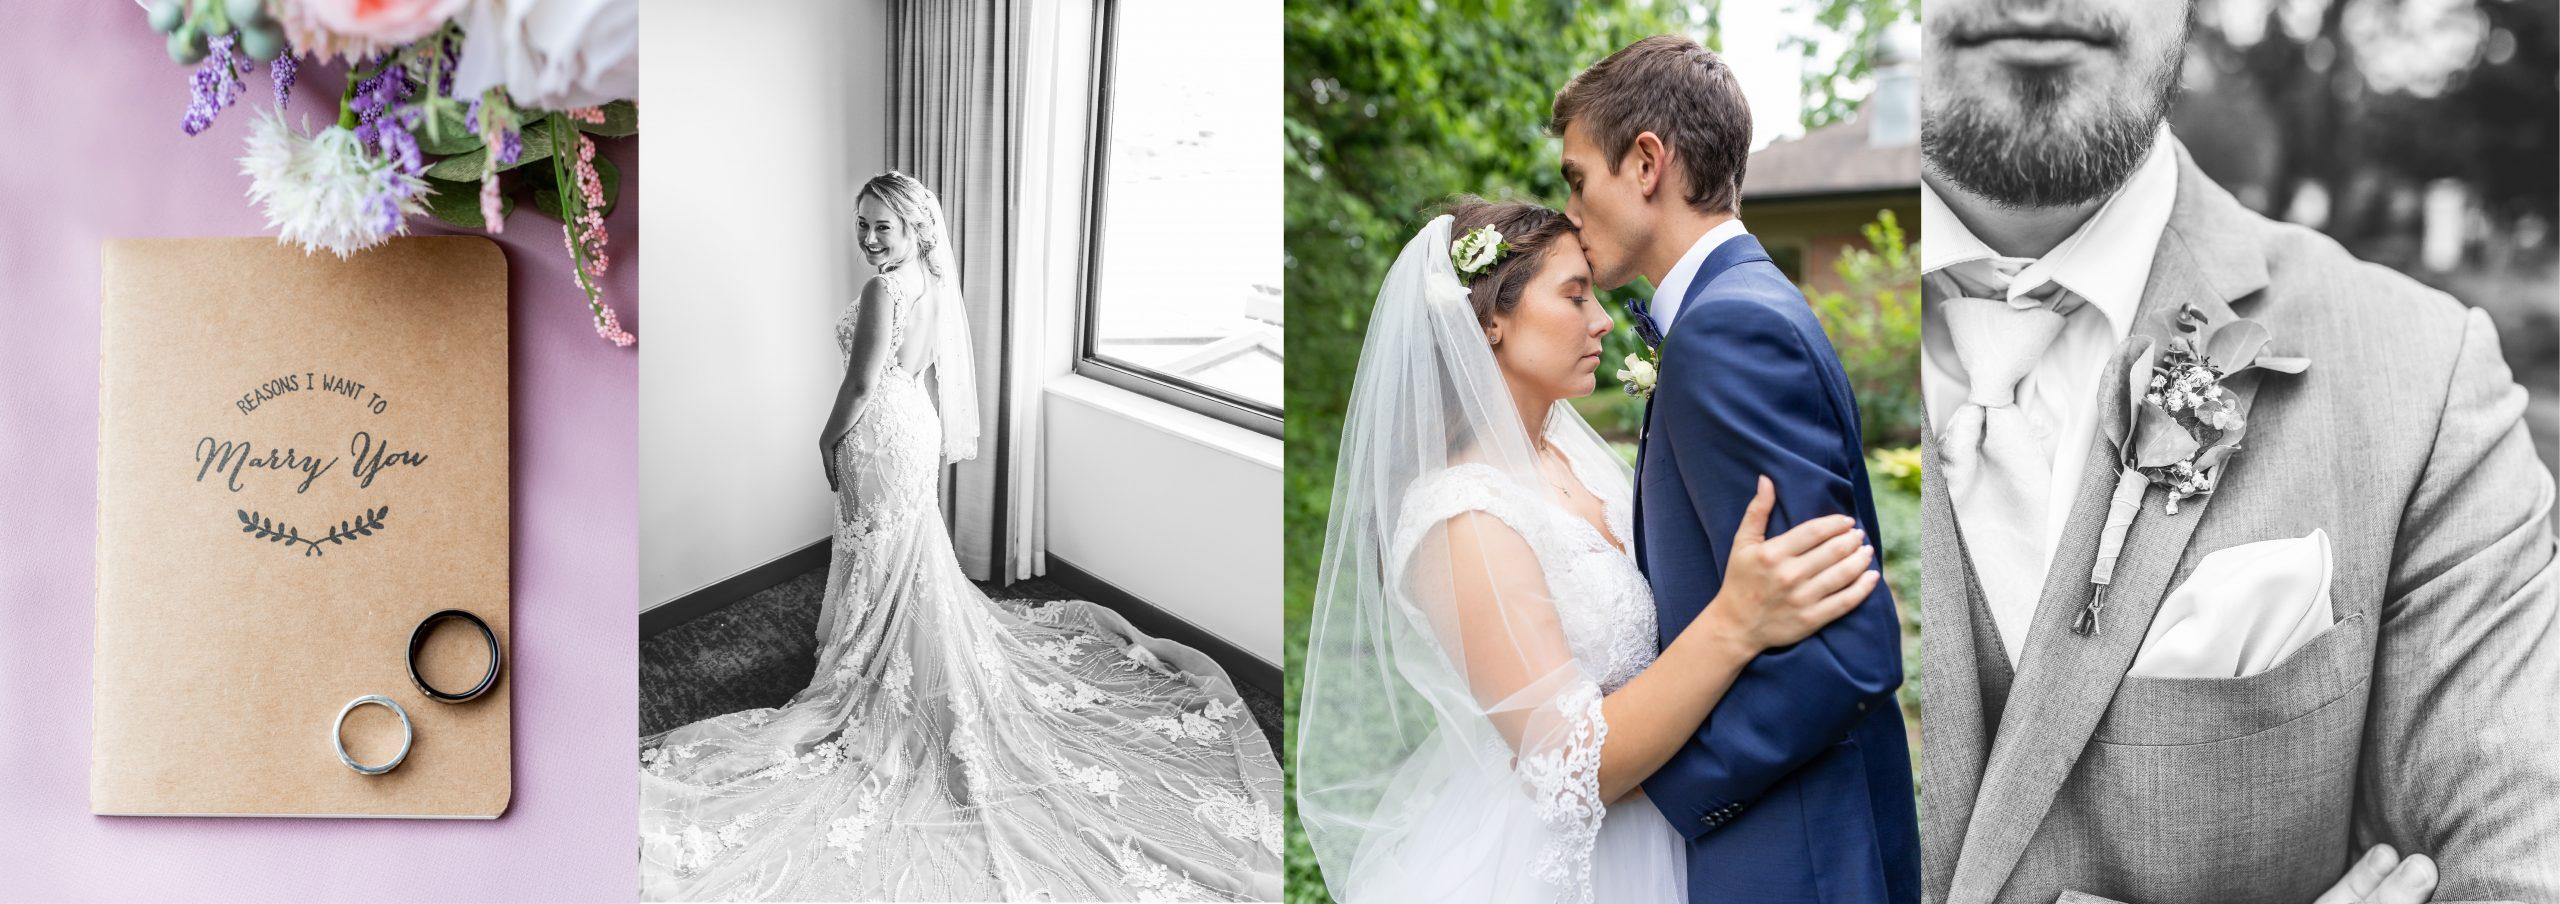 kandra-lynn-photography-michigan-wedding-photographer-11